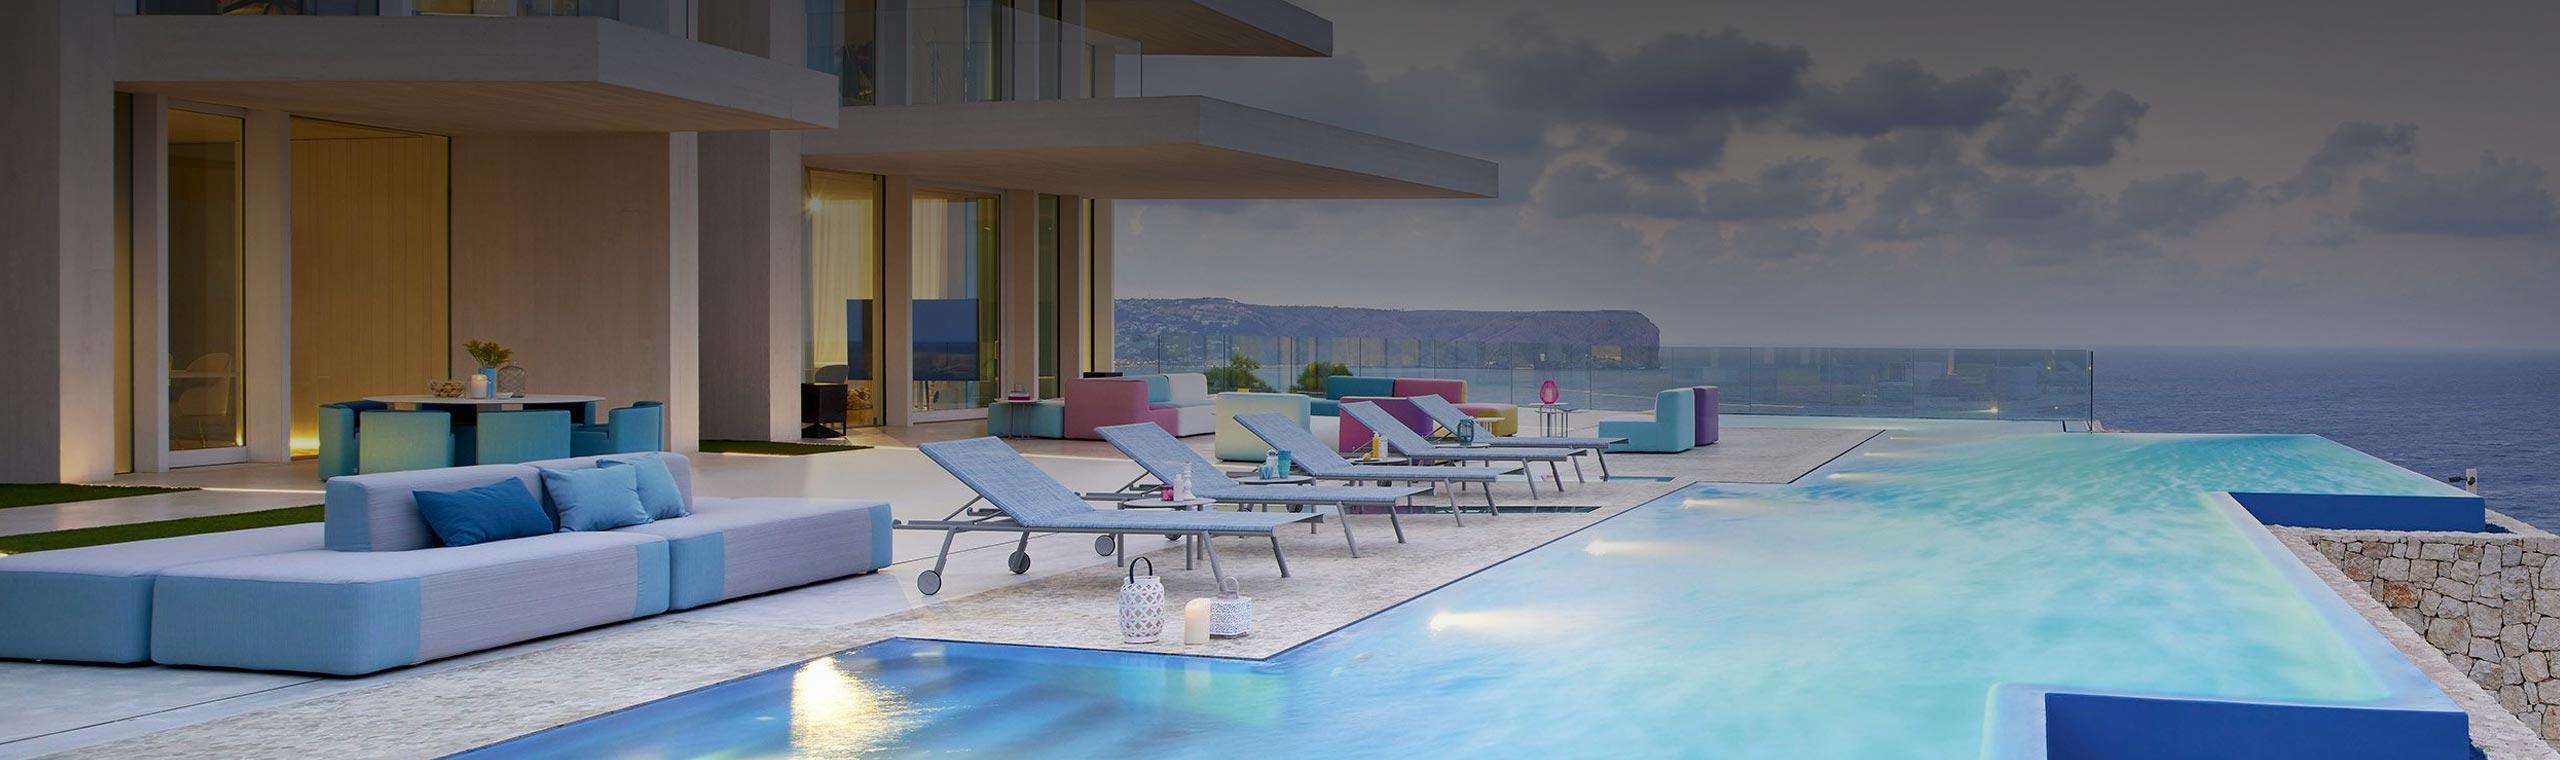 Hospitality Resort Furniture